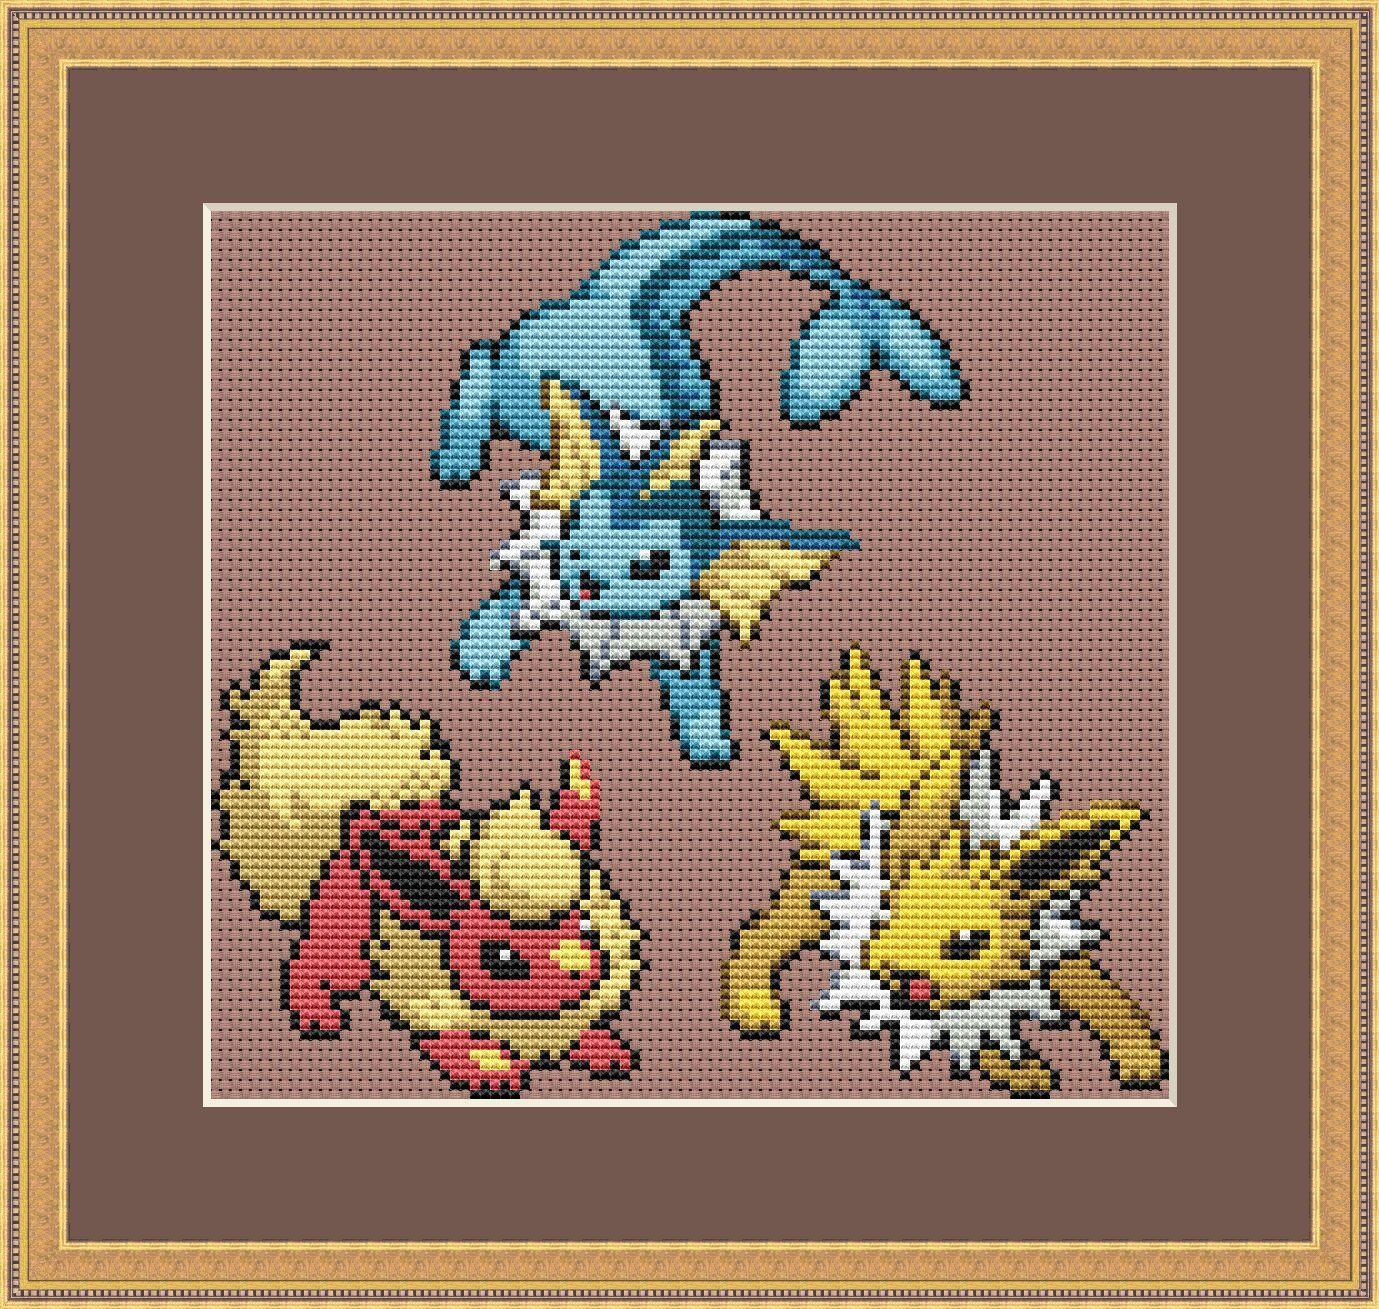 Pokemon Cross Stitch Pattern, Eevee Cross Stitch Pattern